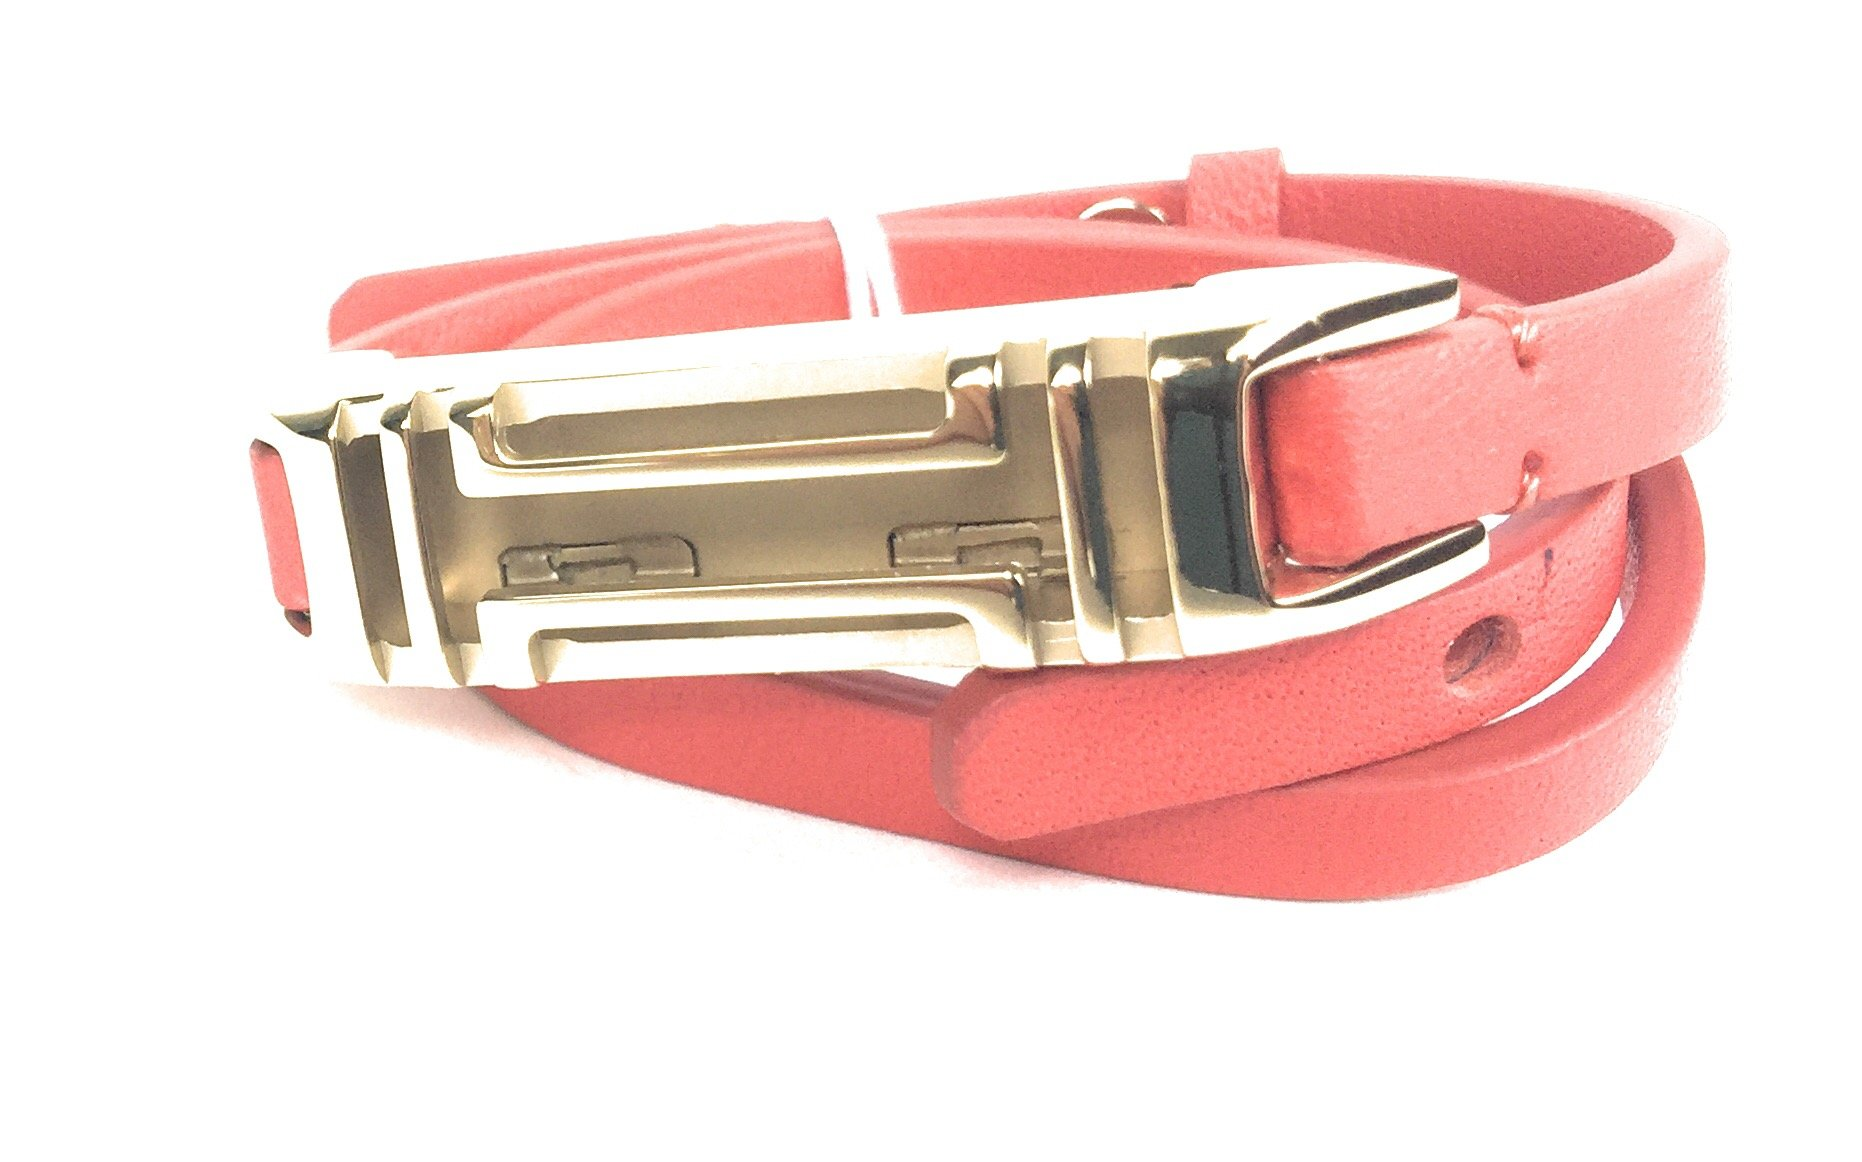 Tory Burch Womens Fitbit Double Wrap Bracelet for Fitbit Flex 2 by Tory Burch (Image #2)